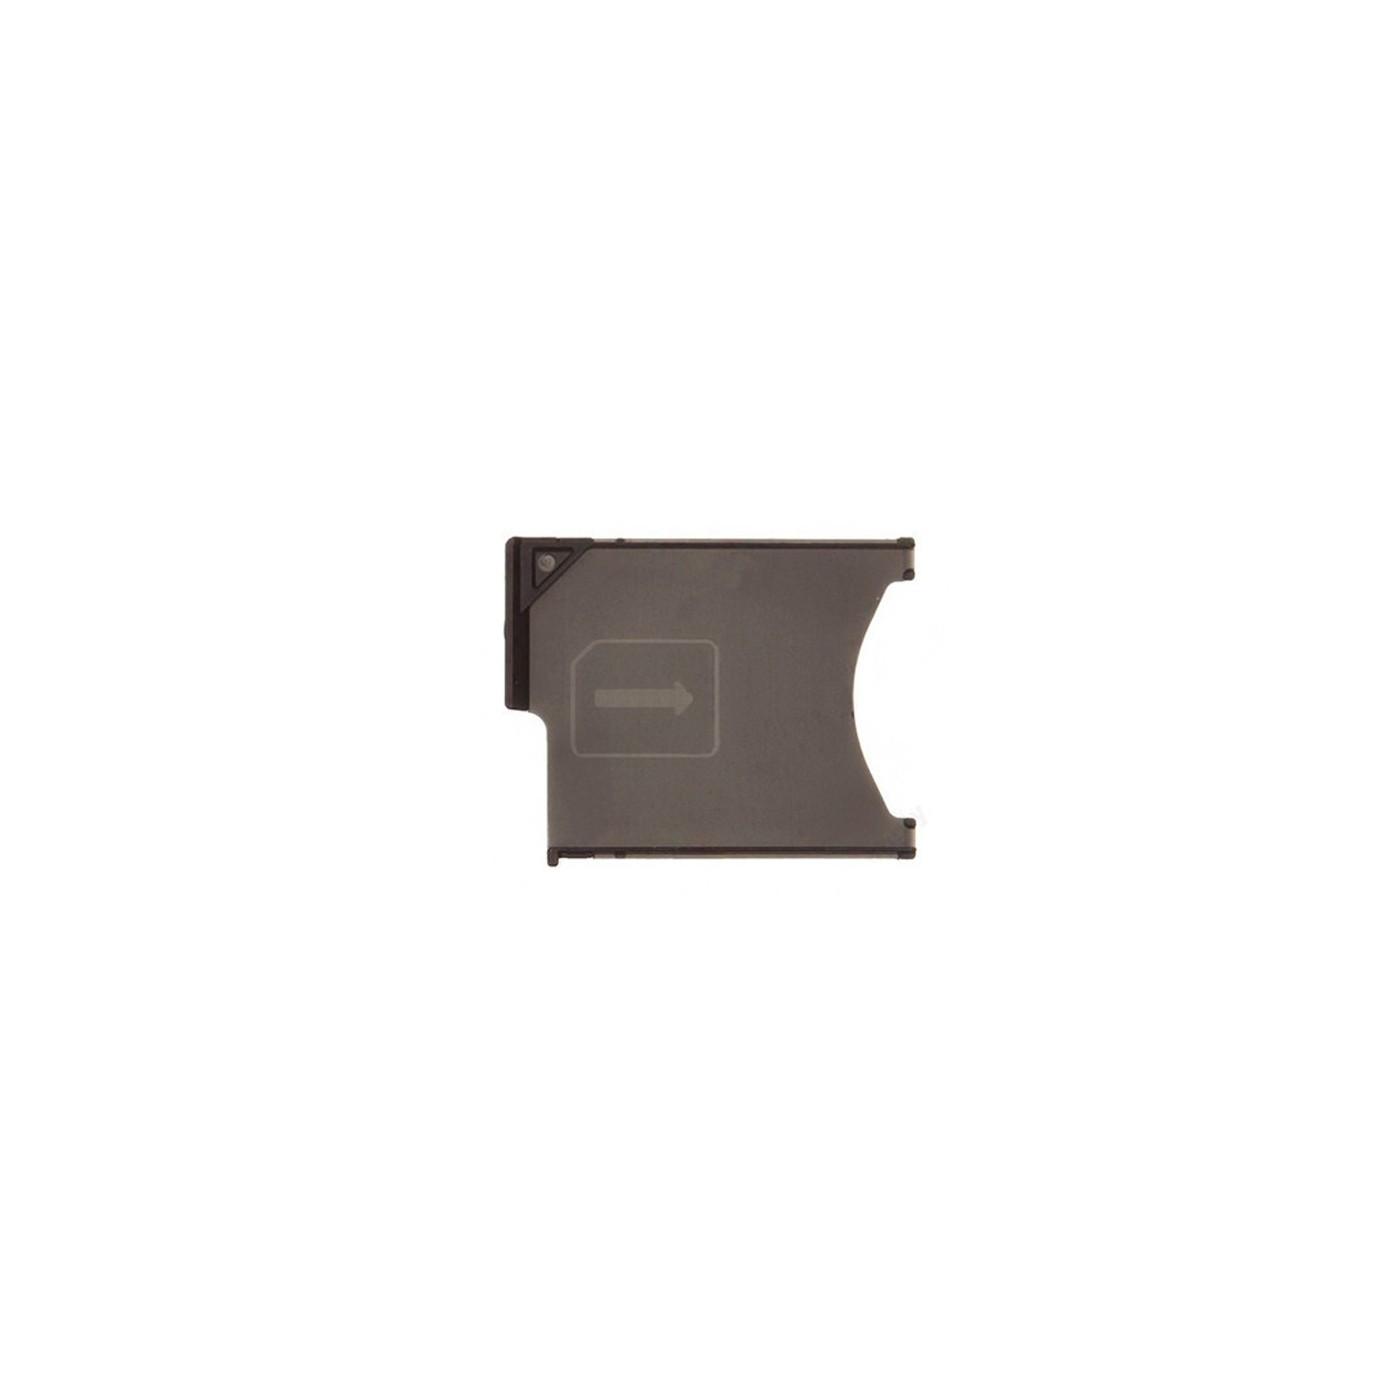 Soporte para tarjeta SIM para Sony Xperia Z C6603 L36h trolley para trineo